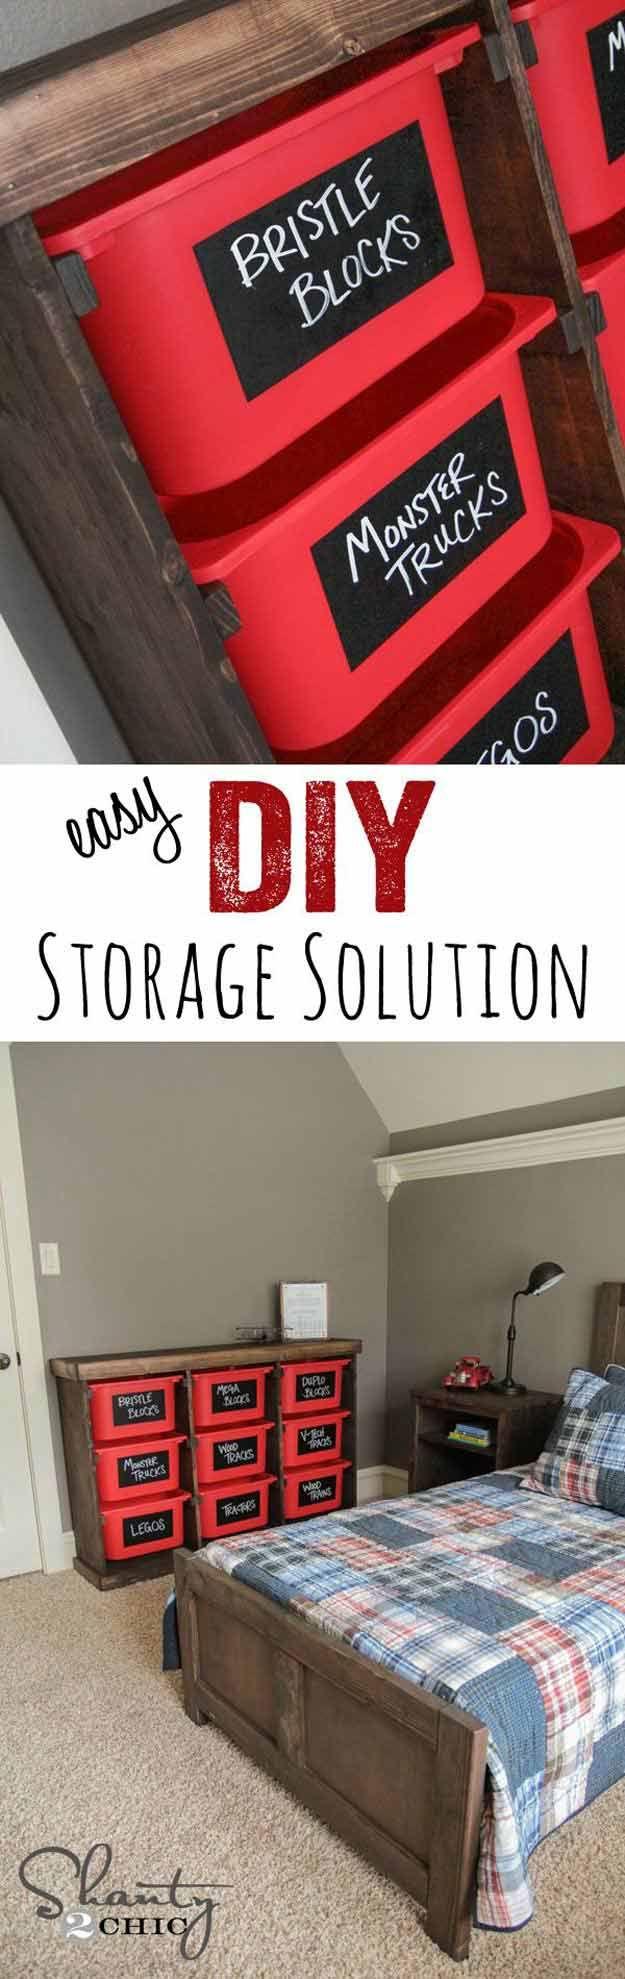 Easy DIY Toy Storage Idea | 24 Smart DIY Toy & Crafts Storage Solutions | Home Organization Ideas and Life Hacks : http://diyready.com/toy-storage-solutions-life-hack/